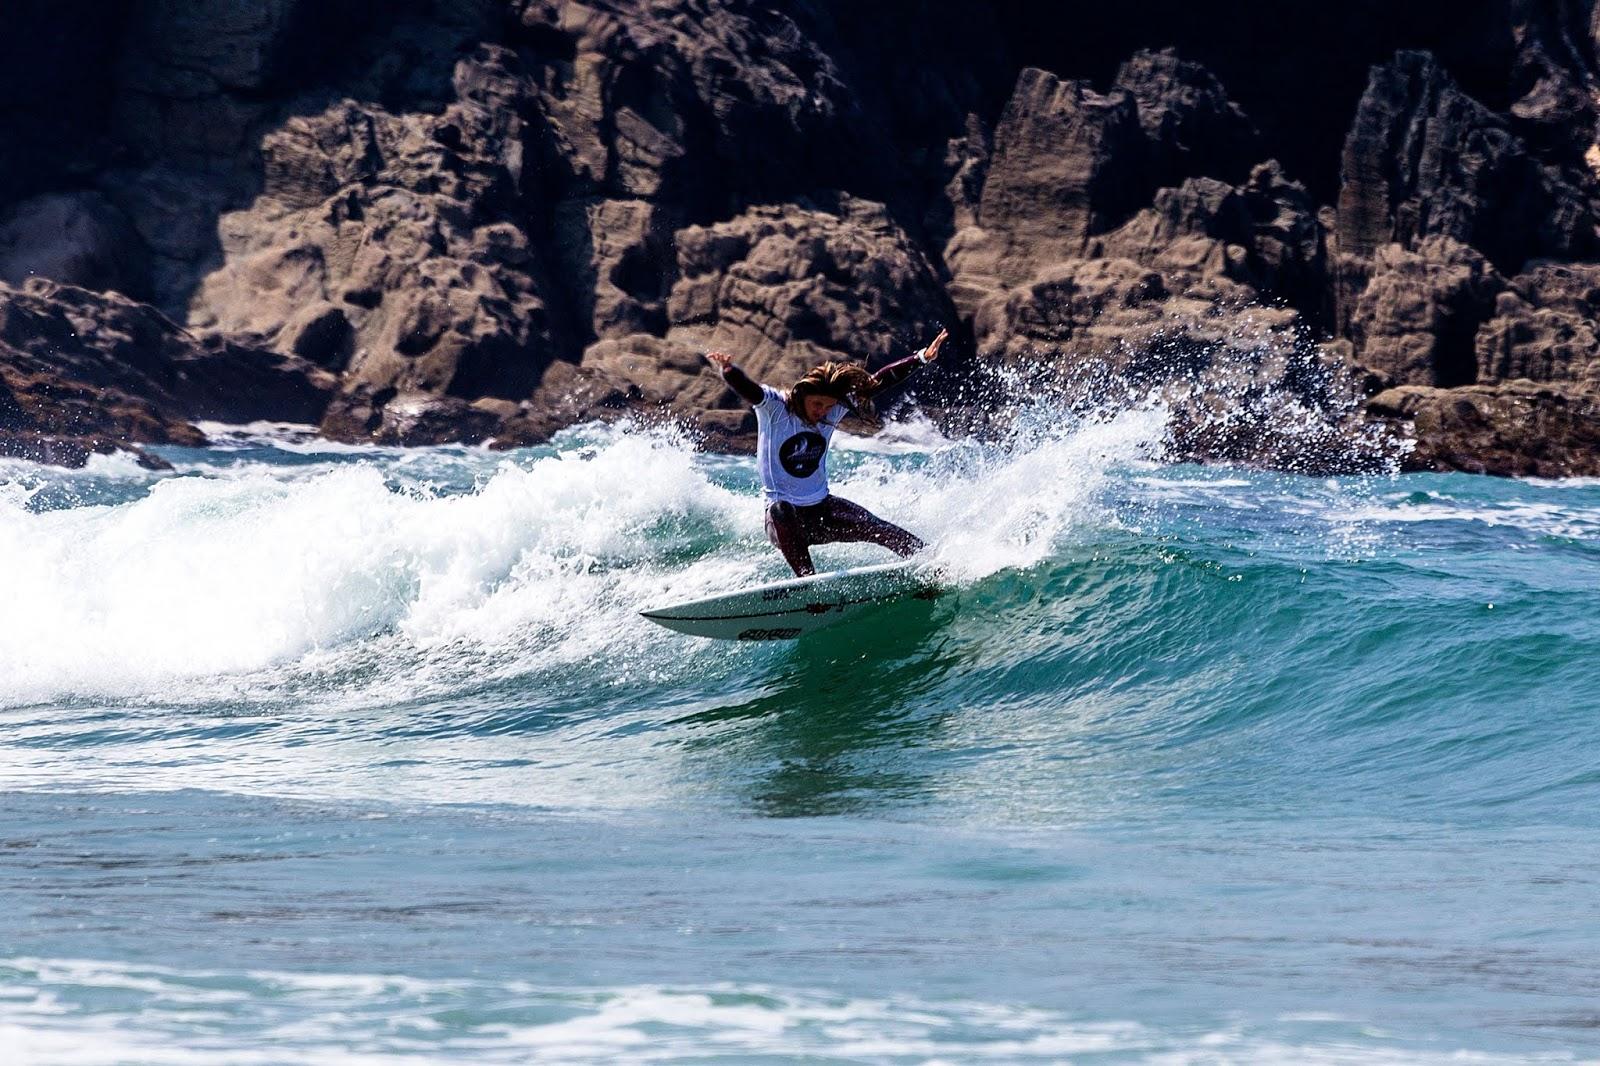 Tapia Goanna Pro - Liga Iberdrola Fesurfing - Resumen jornada final